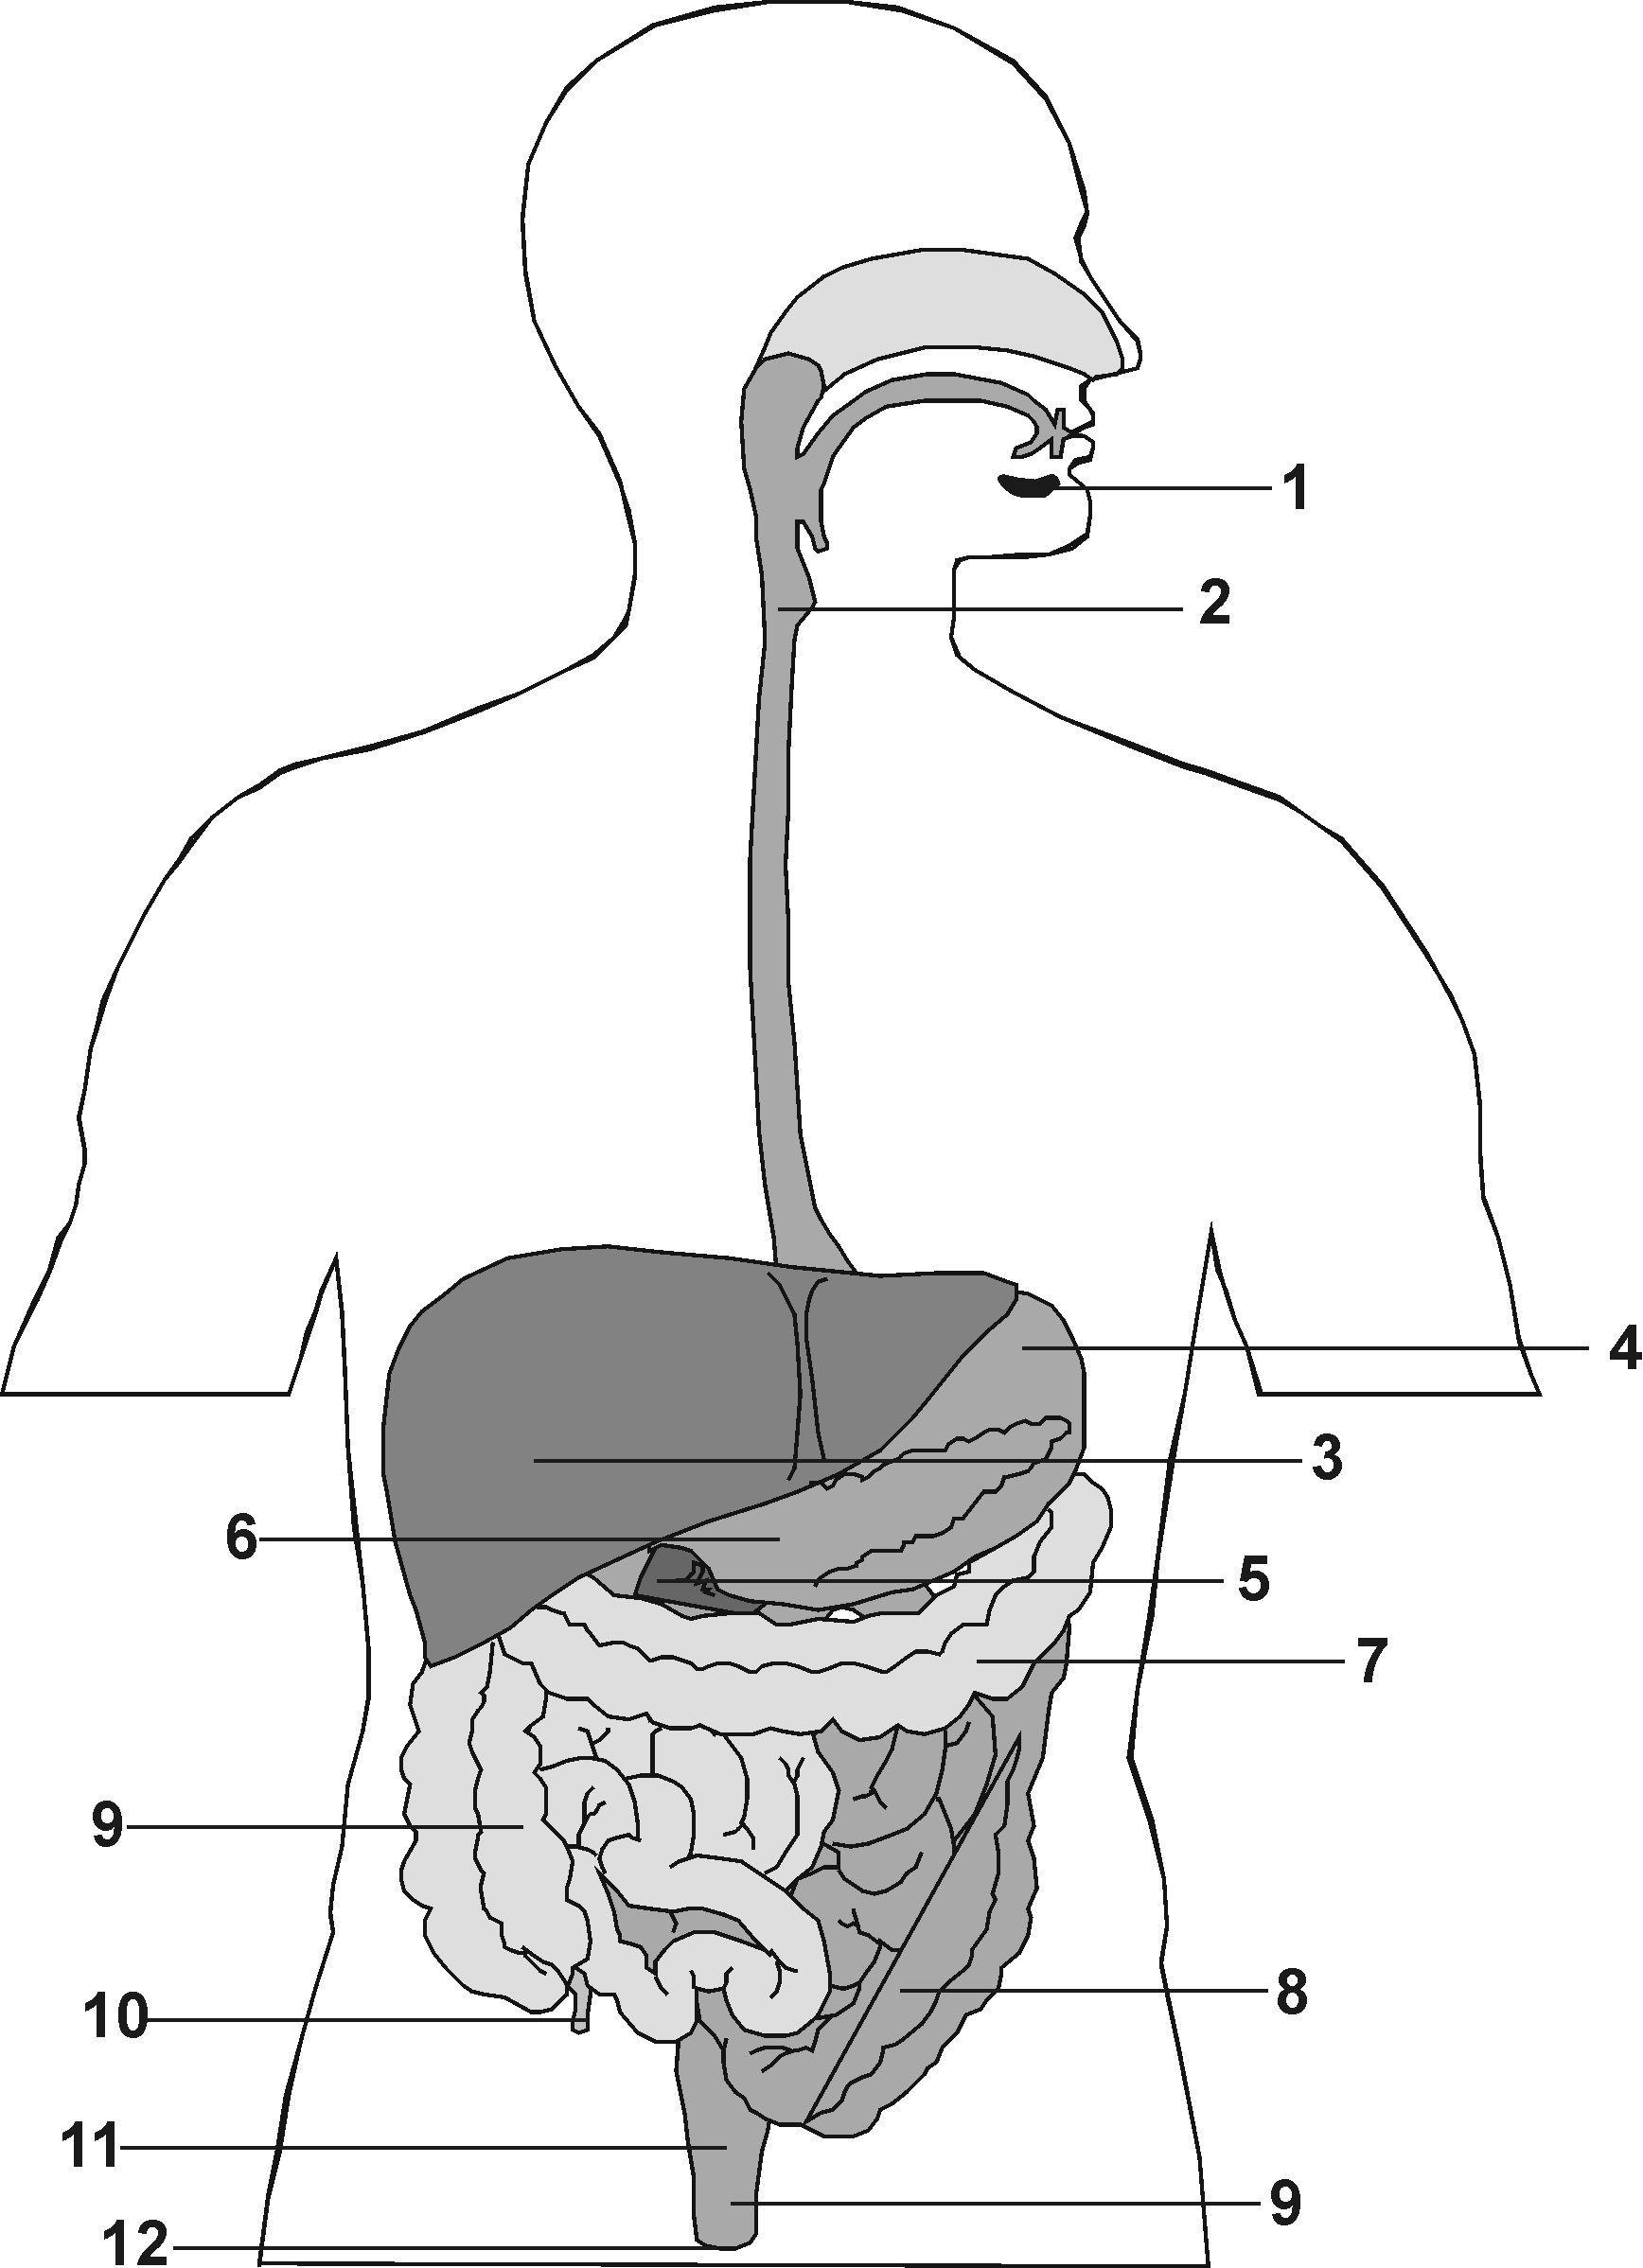 medium resolution of unlabeled diagram of the digestive system unlabeled diagram of the unlabeled body diagram